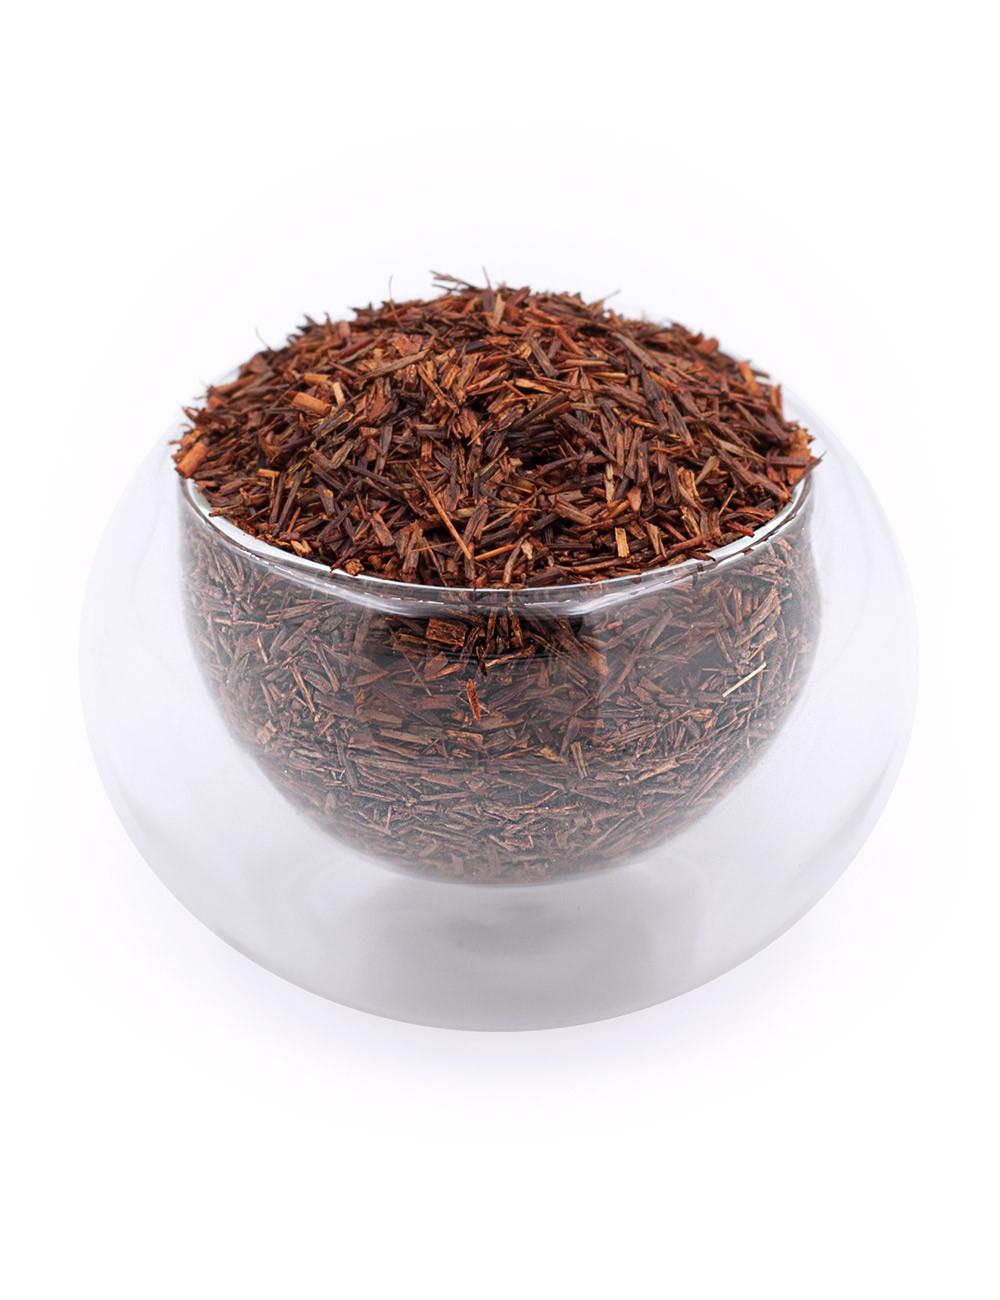 Rooibos Naturale BIO - La Pianta del Tè shop online